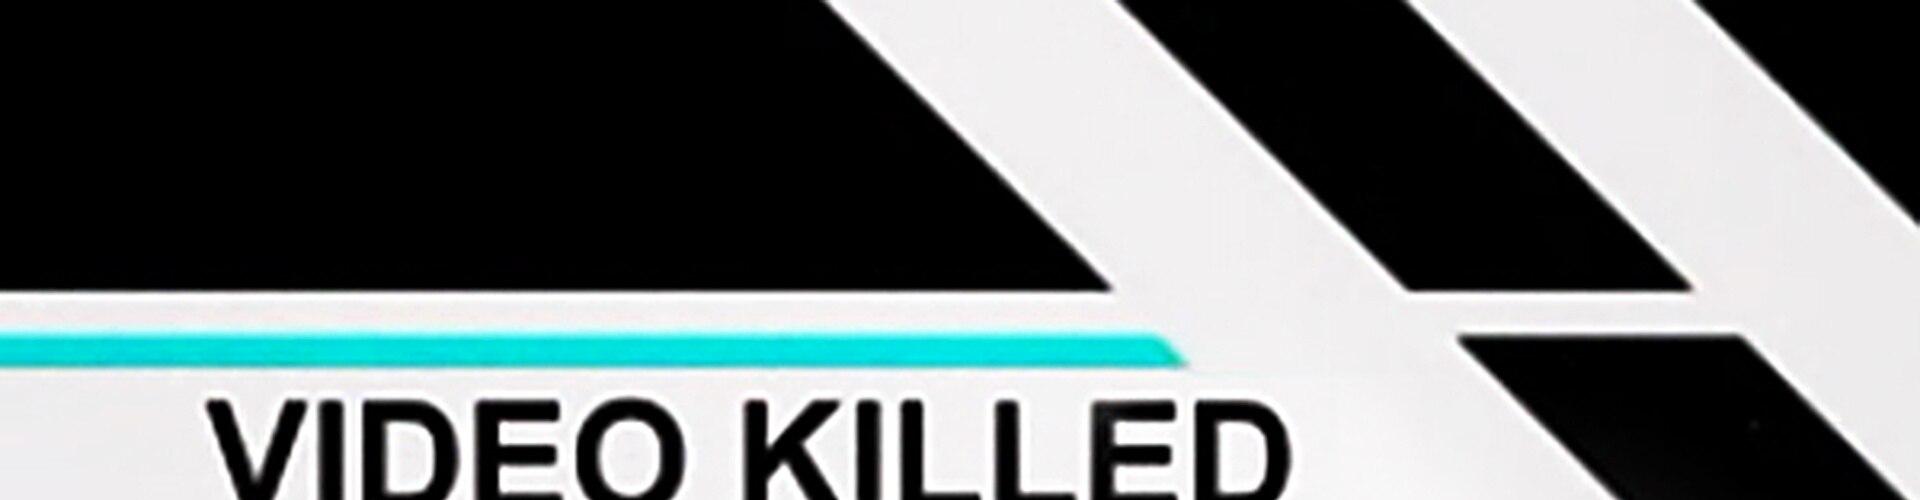 Watch Kim Wilde: Video Killed... Online